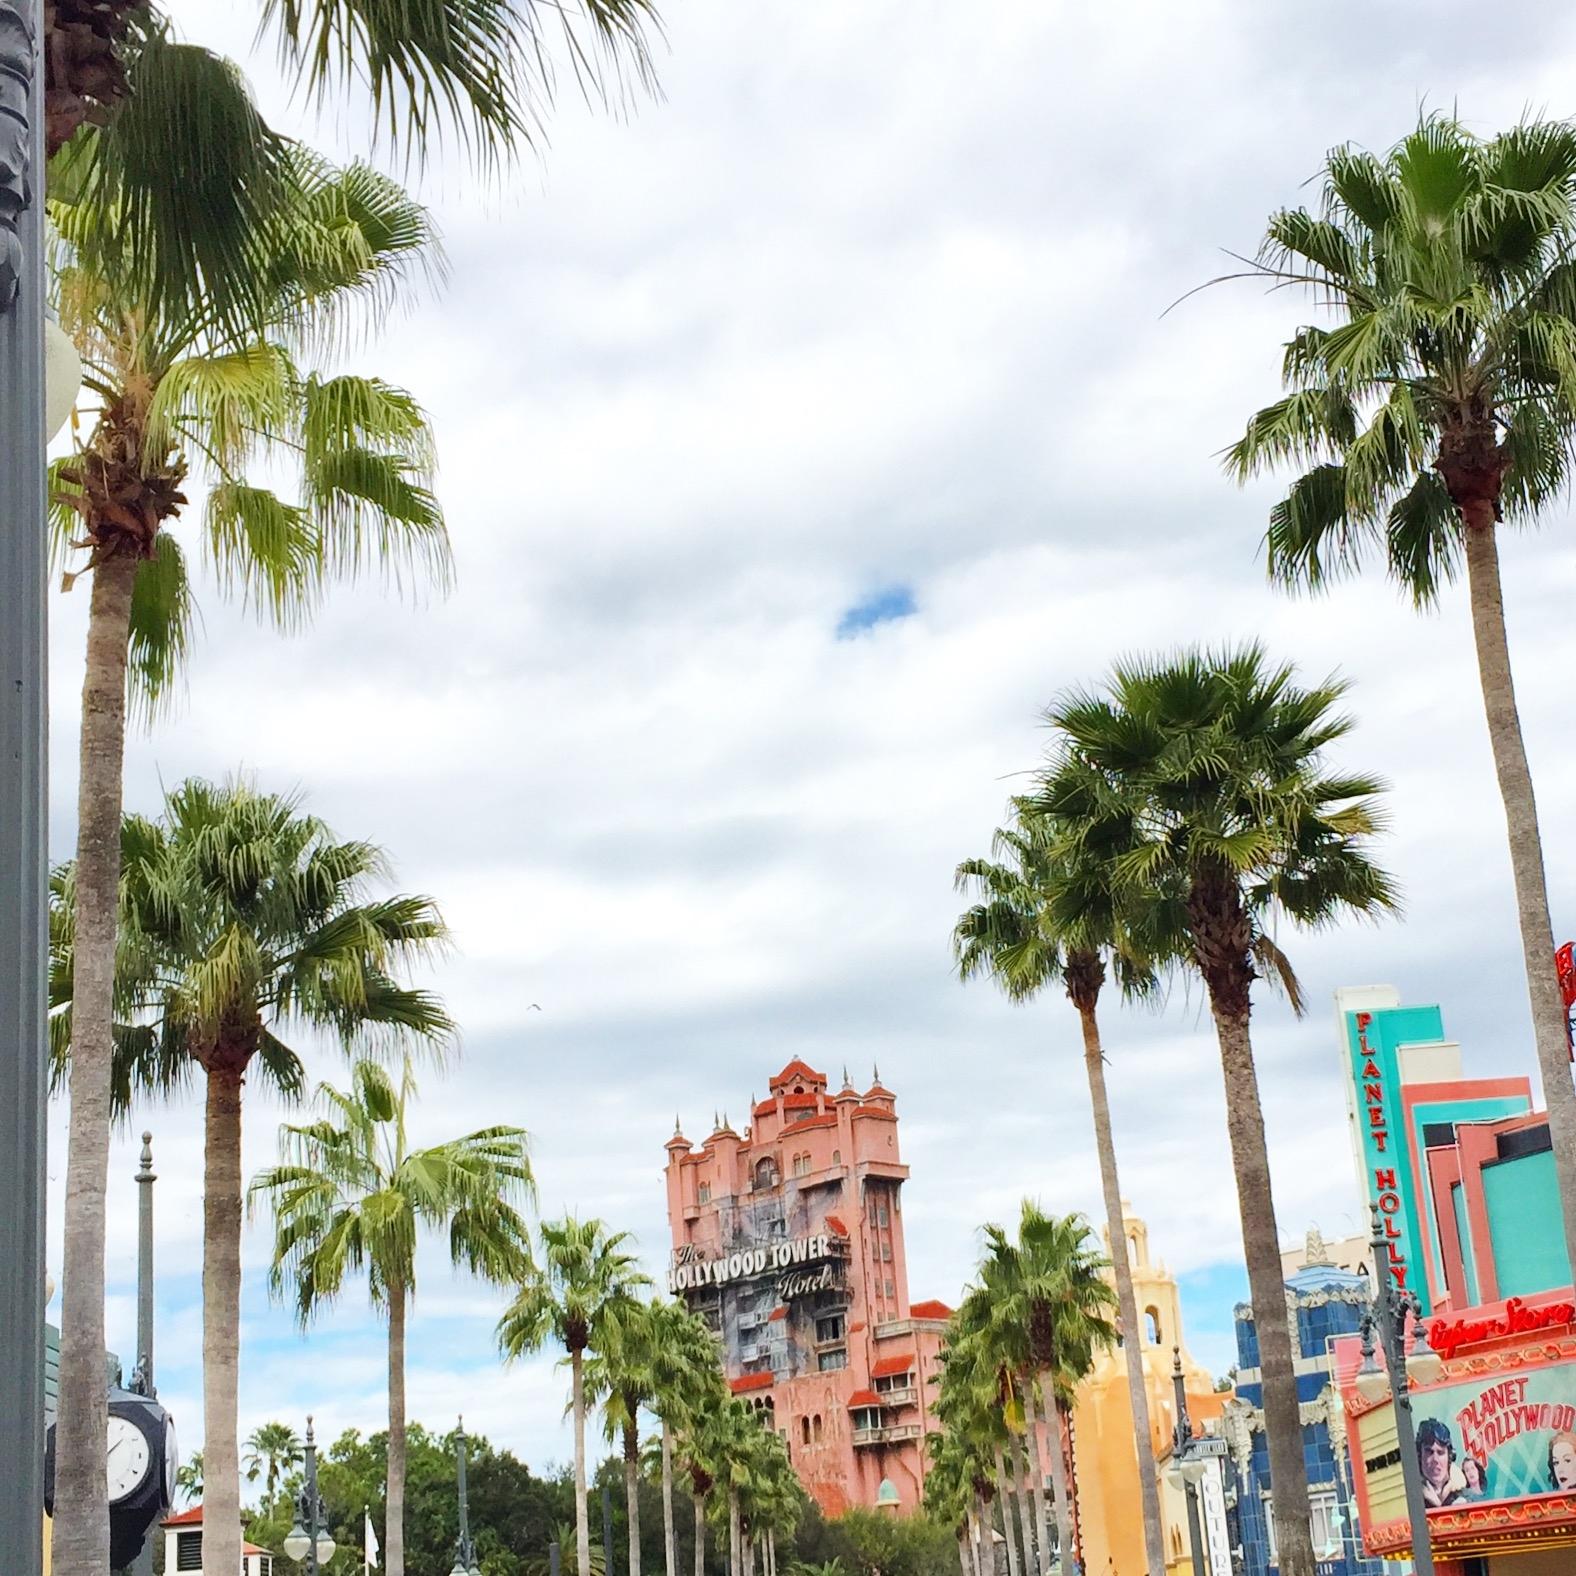 Adults Only Walt Disney World Vacation Recap and Vlog (Part 2) | January 2017 | Blairblogs.com